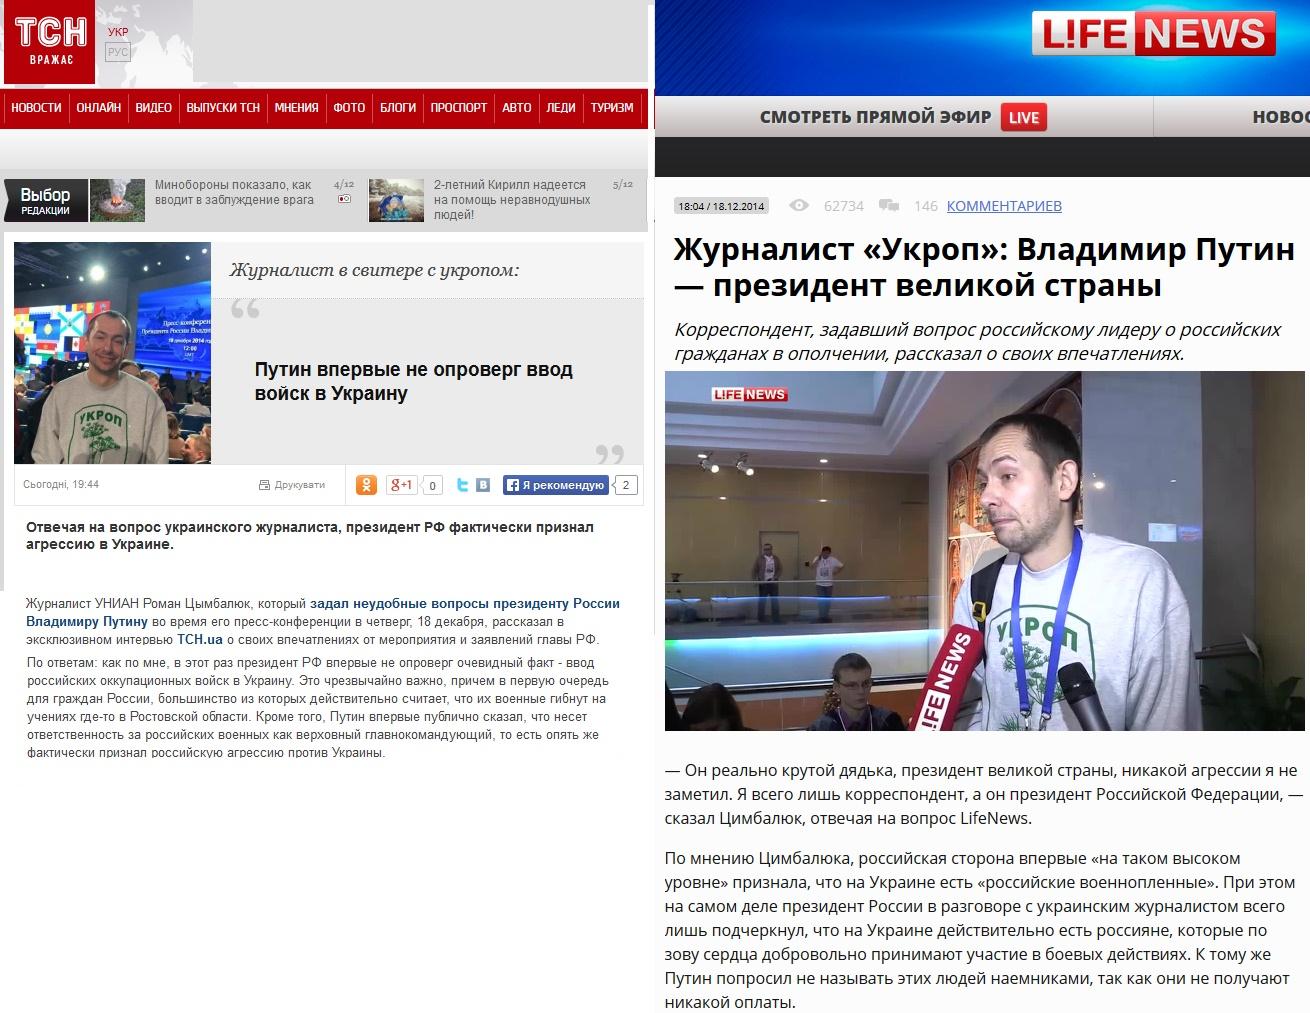 https://img-fotki.yandex.ru/get/16193/42410816.8d/0_e078d_3470dbe6_orig